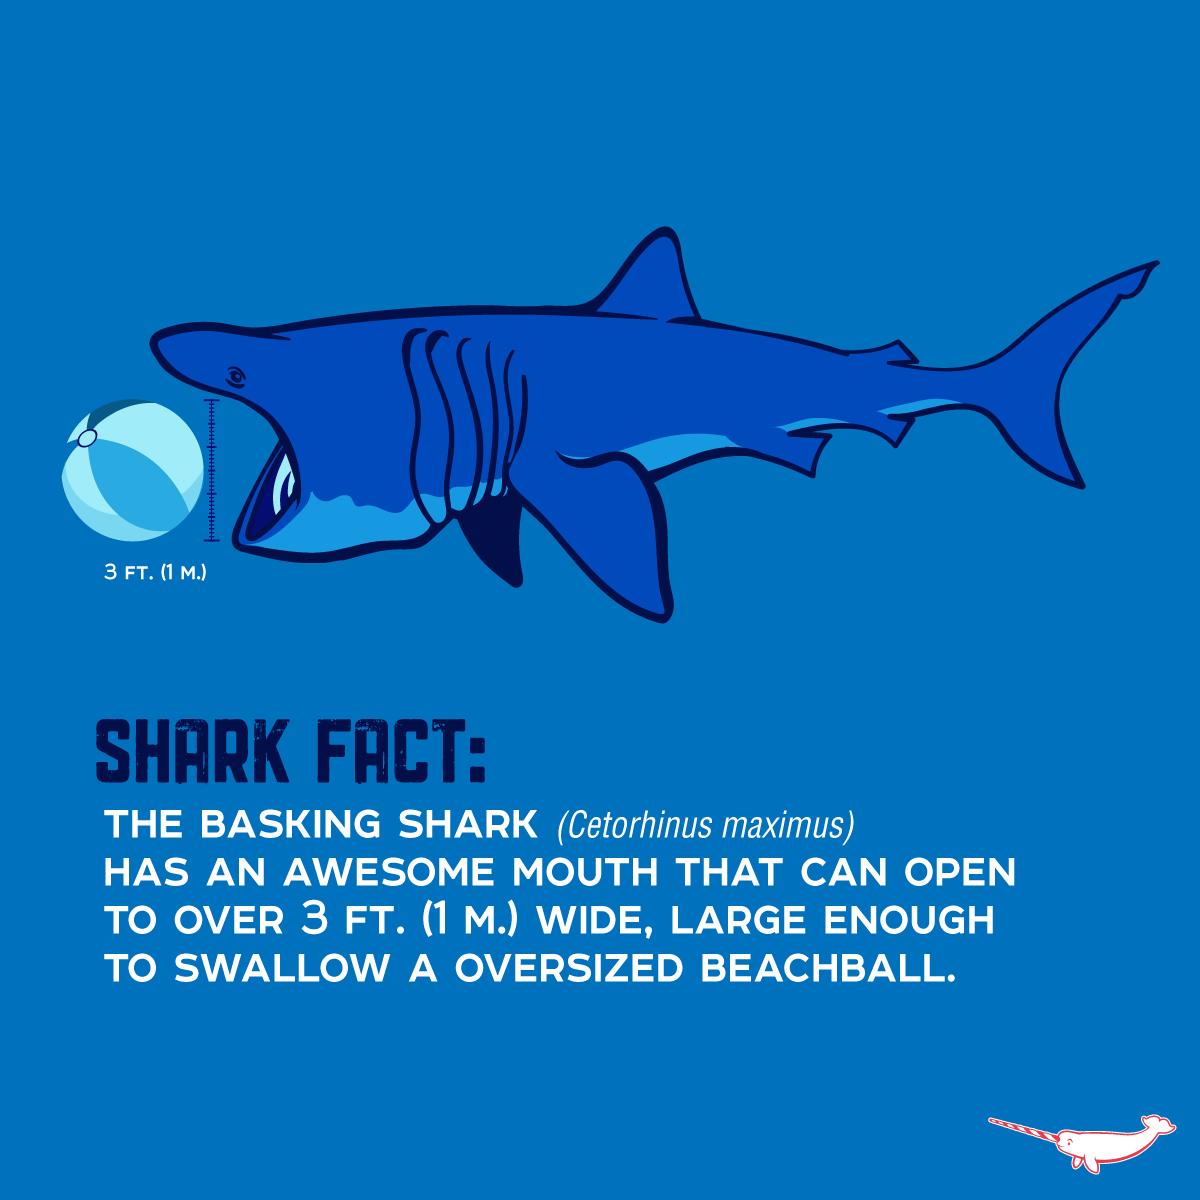 an analysis of the sluggish monster cetorhinus maximus the basking shark Populations & ecosystems monitoring & analysis a basking shark from the air researchers analyzed aggregations of basking sharks (cetorhinus maximus).